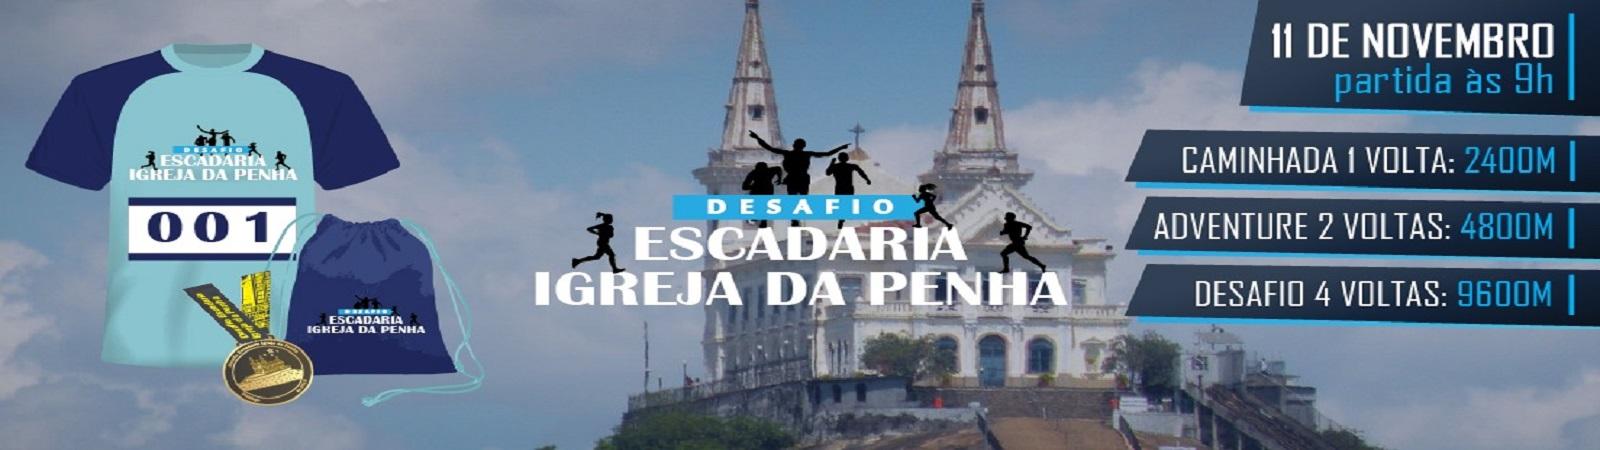 Desafio Escadaria Igreja da Penha - Imagem de topo